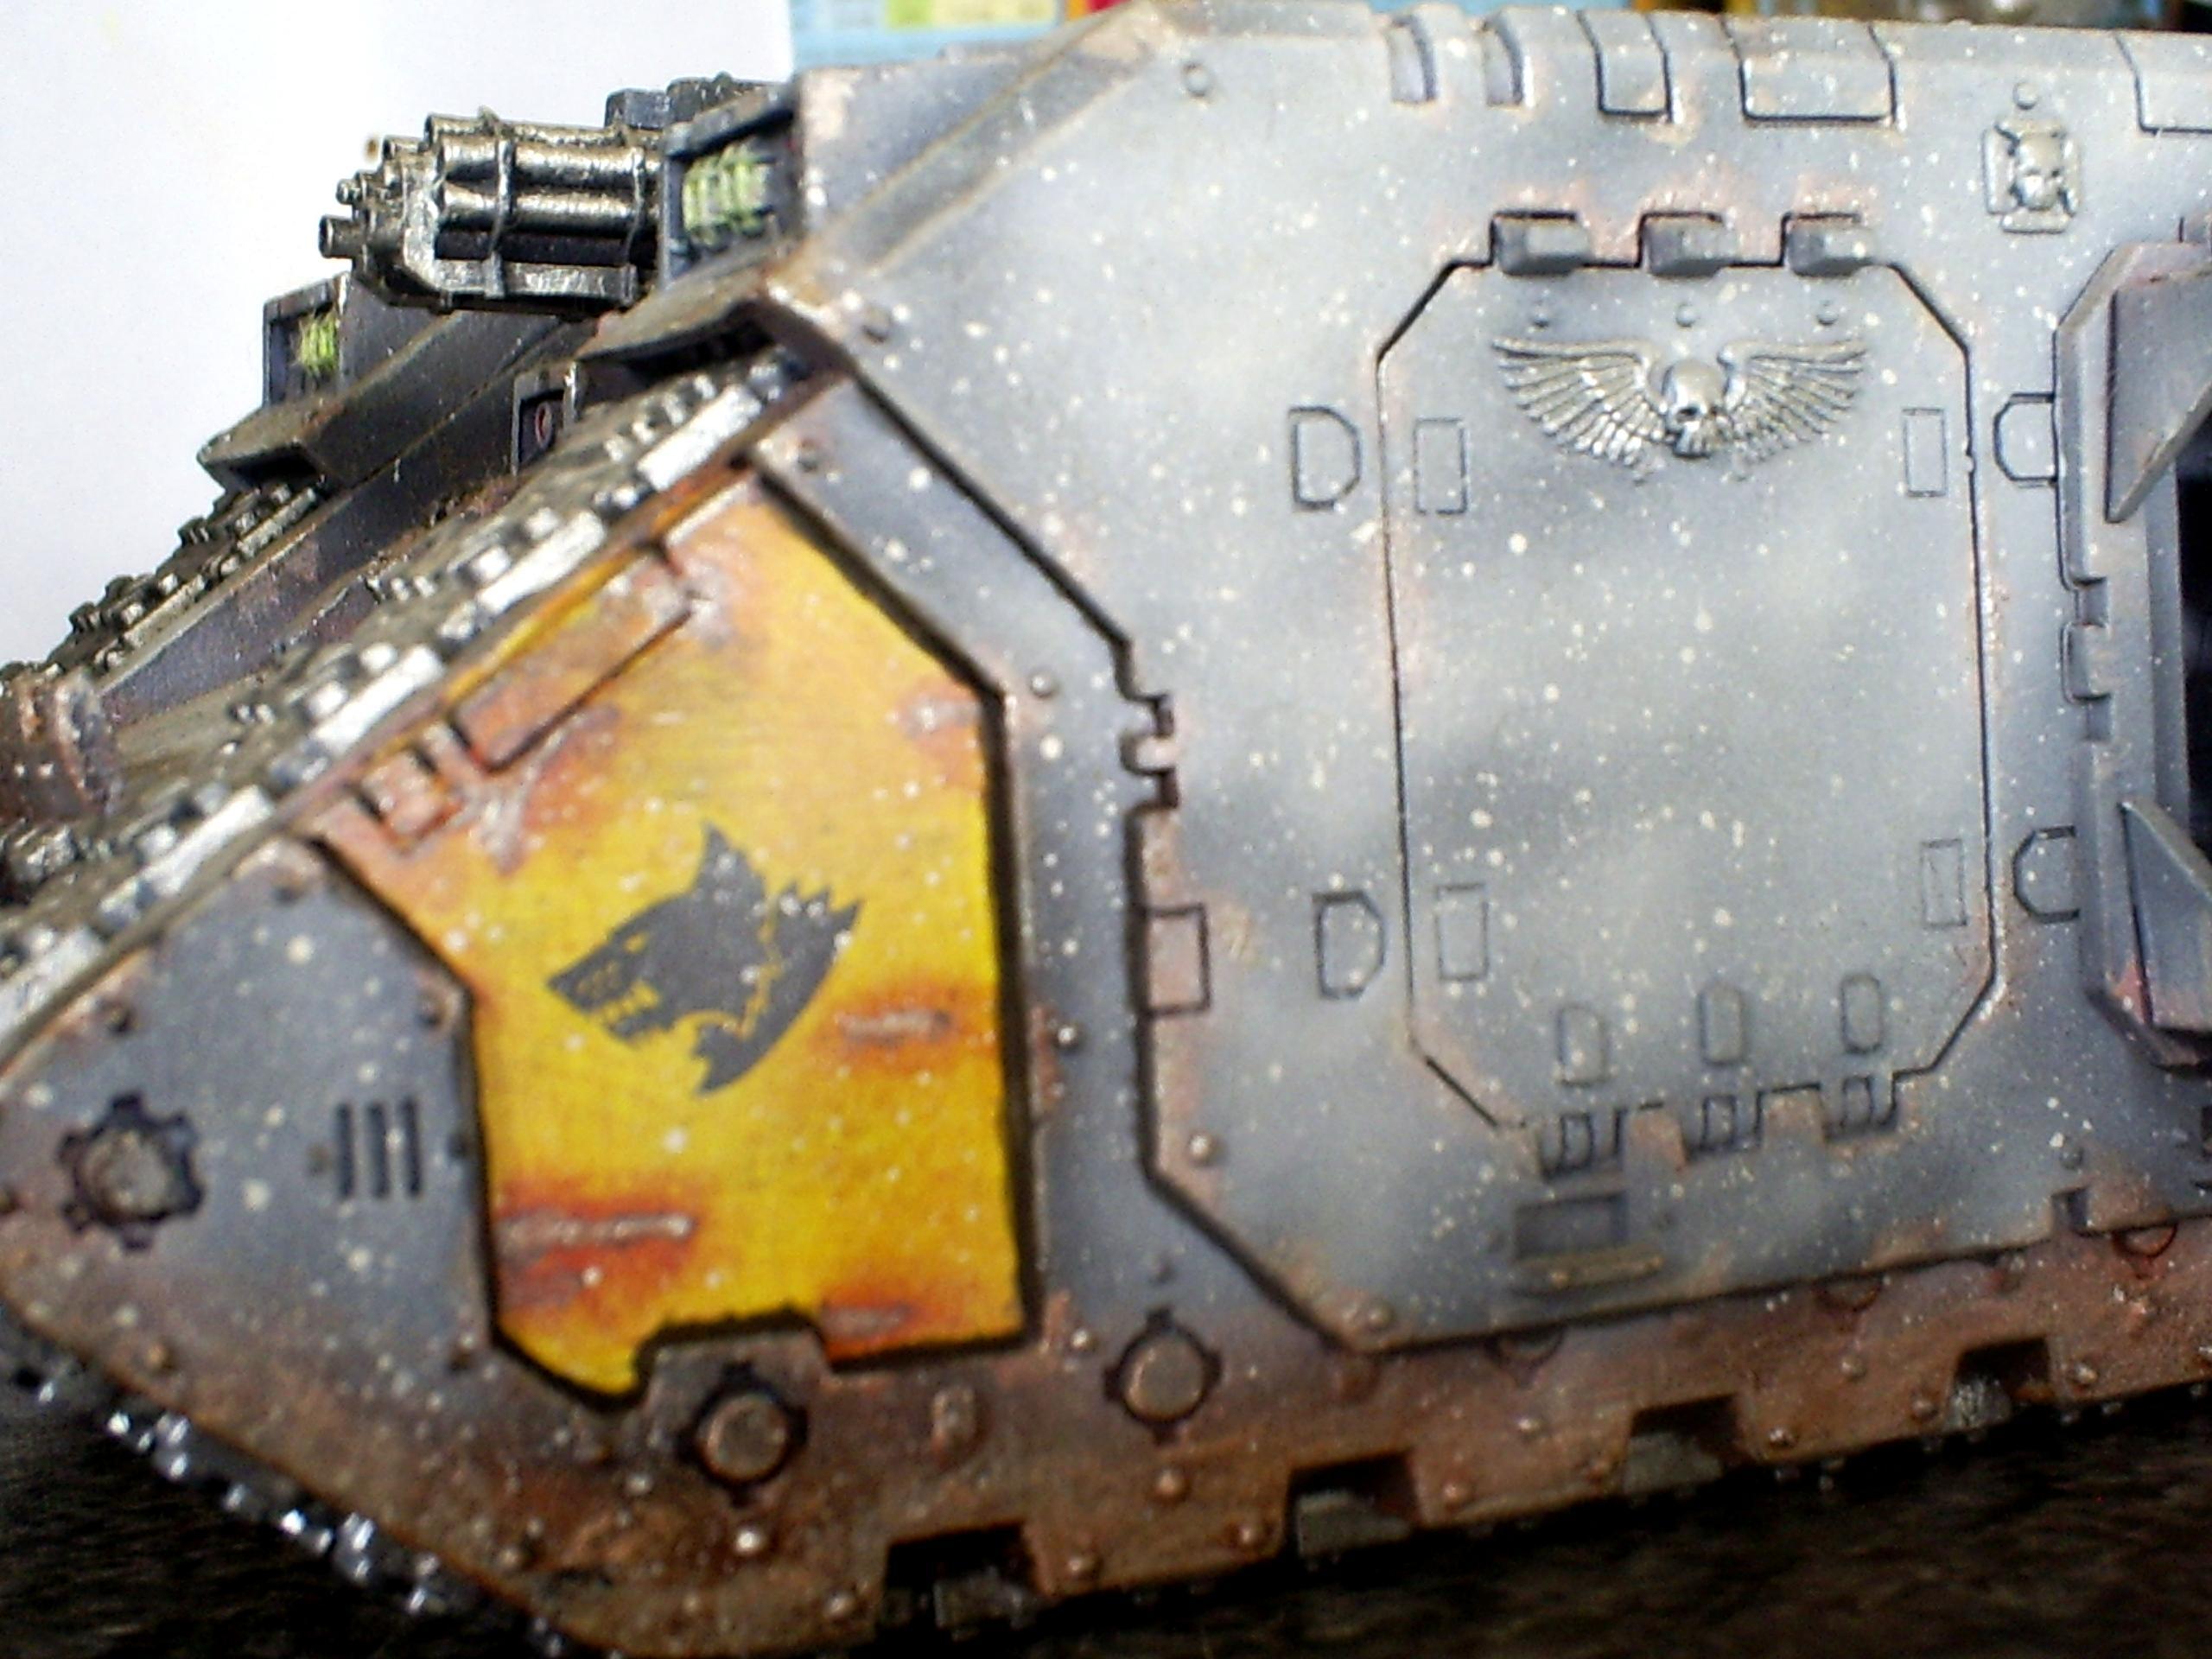 Camouflage, Land Raider, Space Marines, Space Wolves, Warhammer 40,000